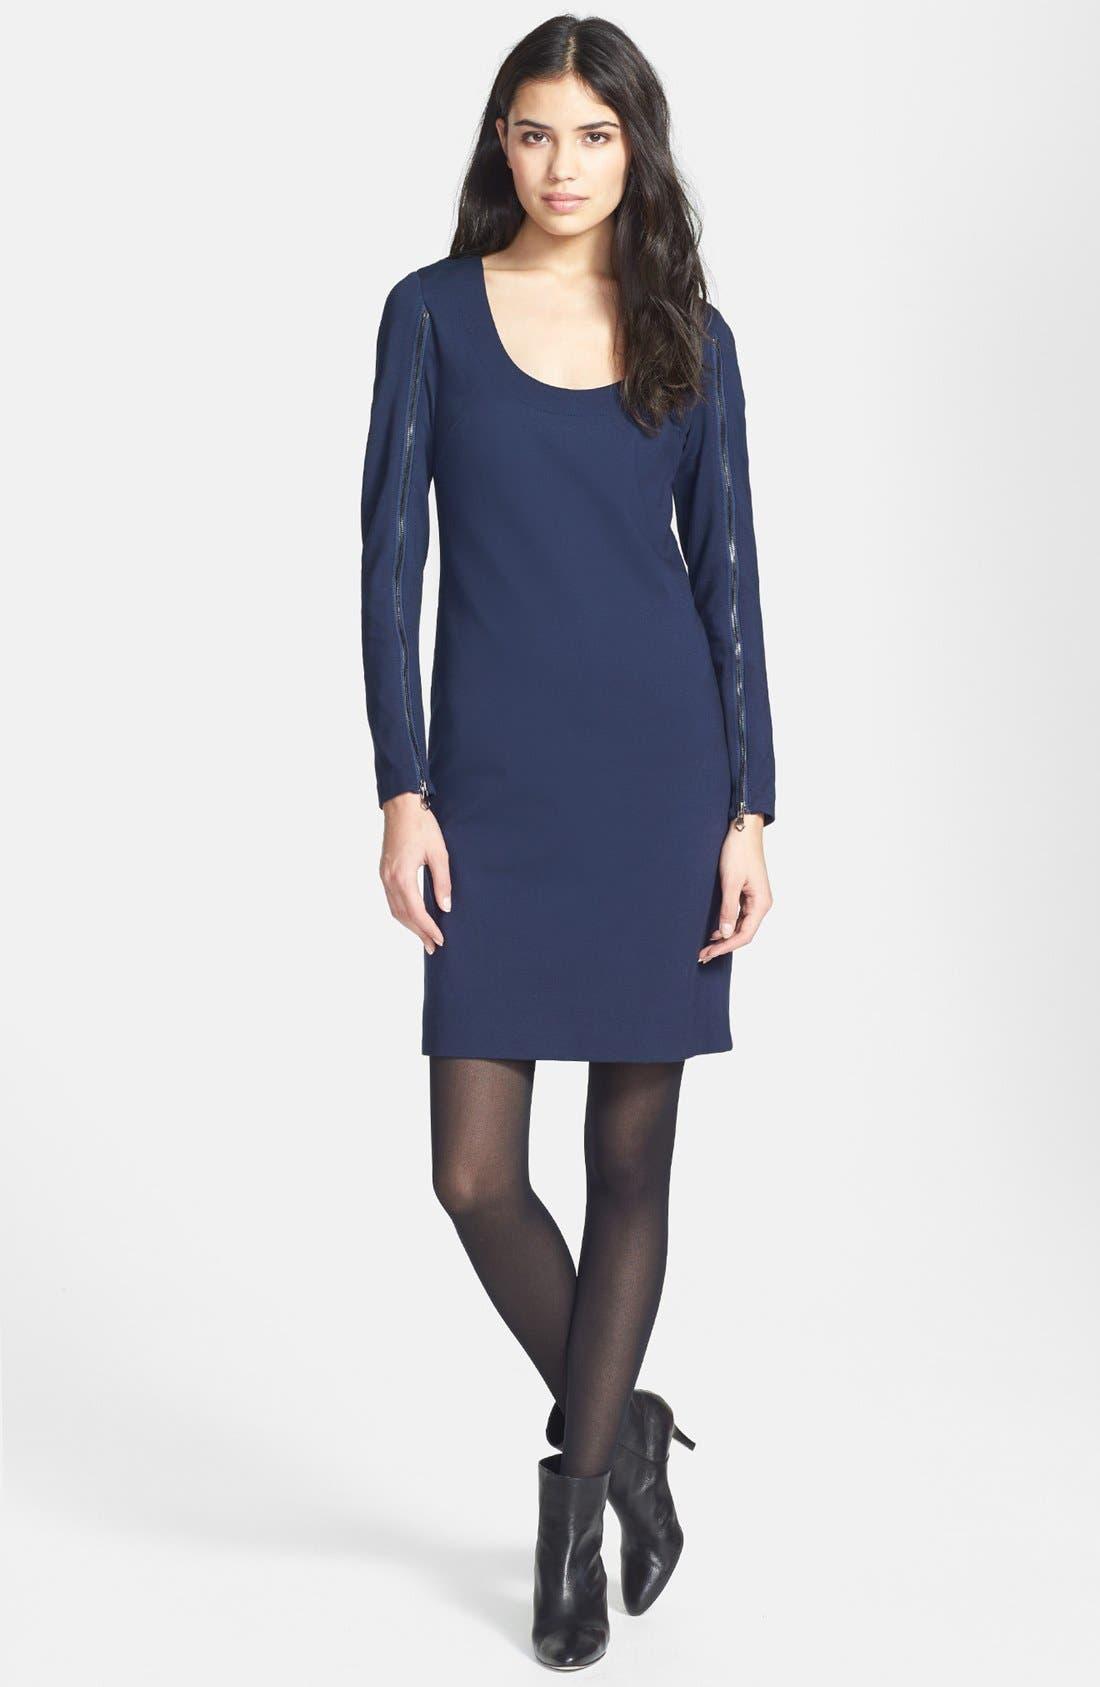 Alternate Image 1 Selected - Trina Turk 'Camilla' Ponte Sheath Dress